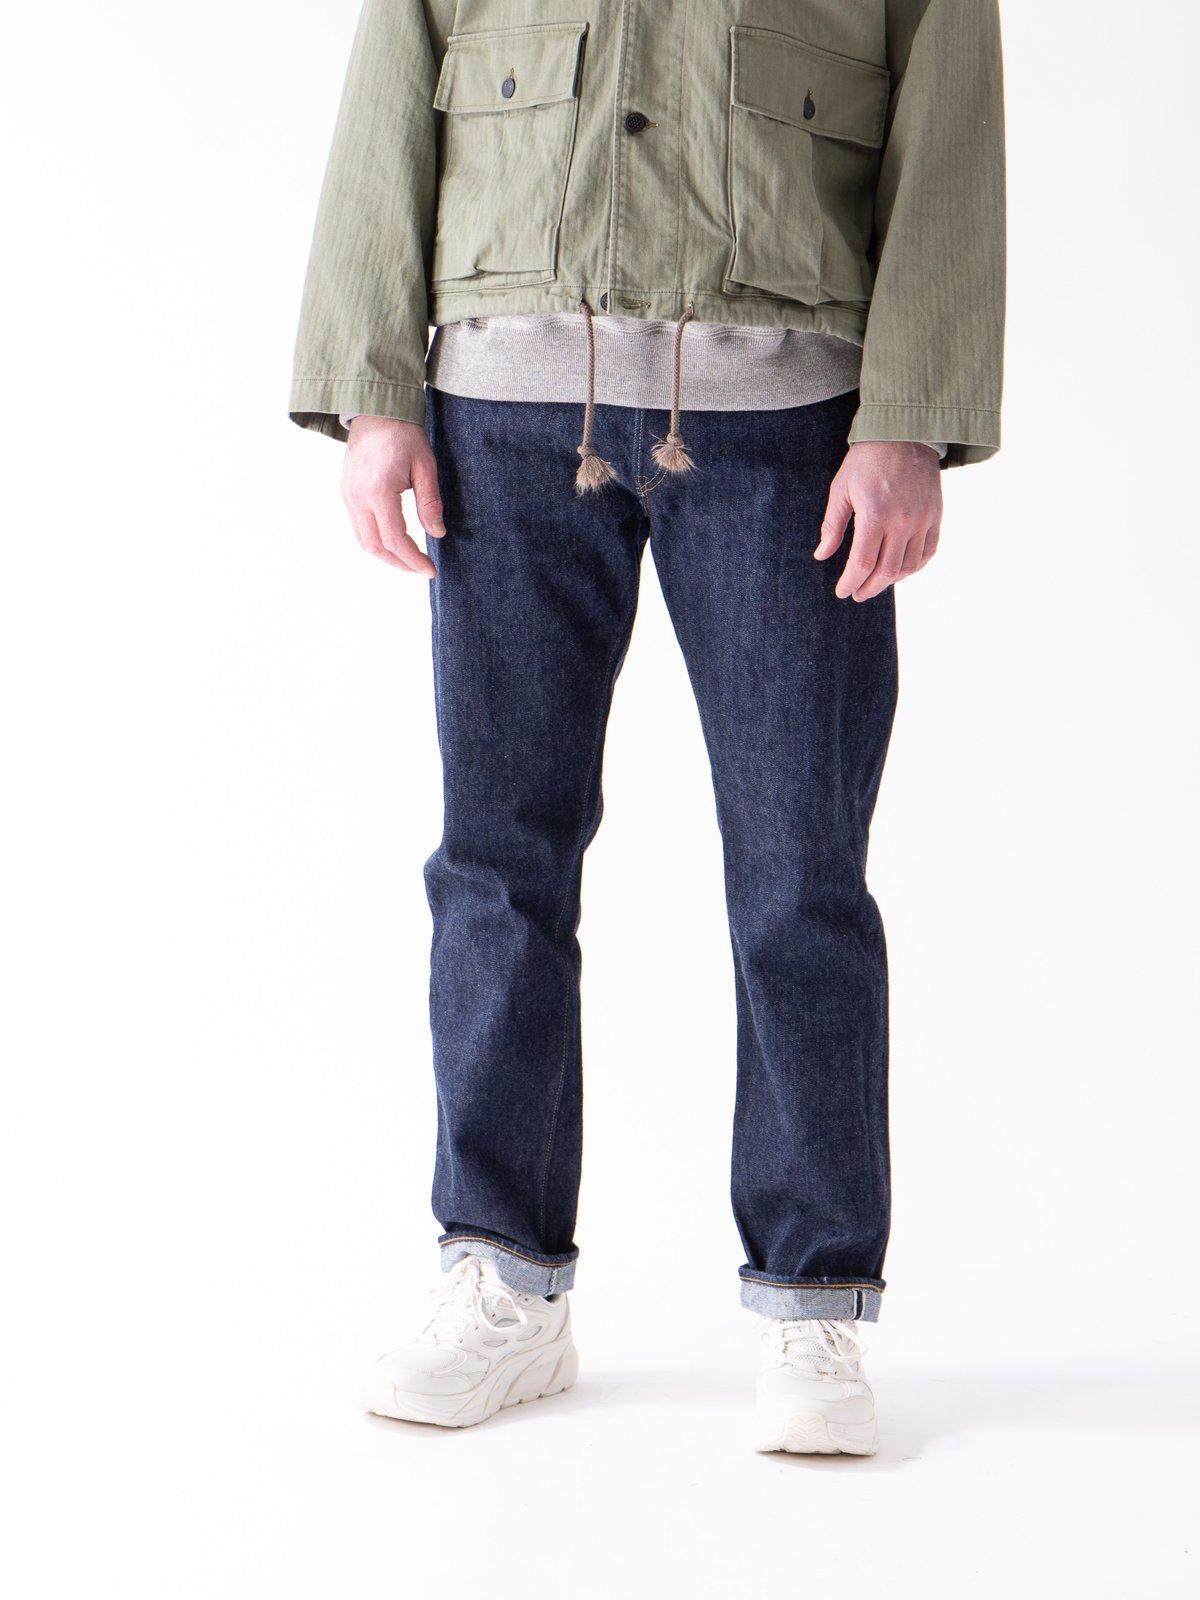 Indigo One Wash 105 Standard 5 Pocket Jean - Image 2